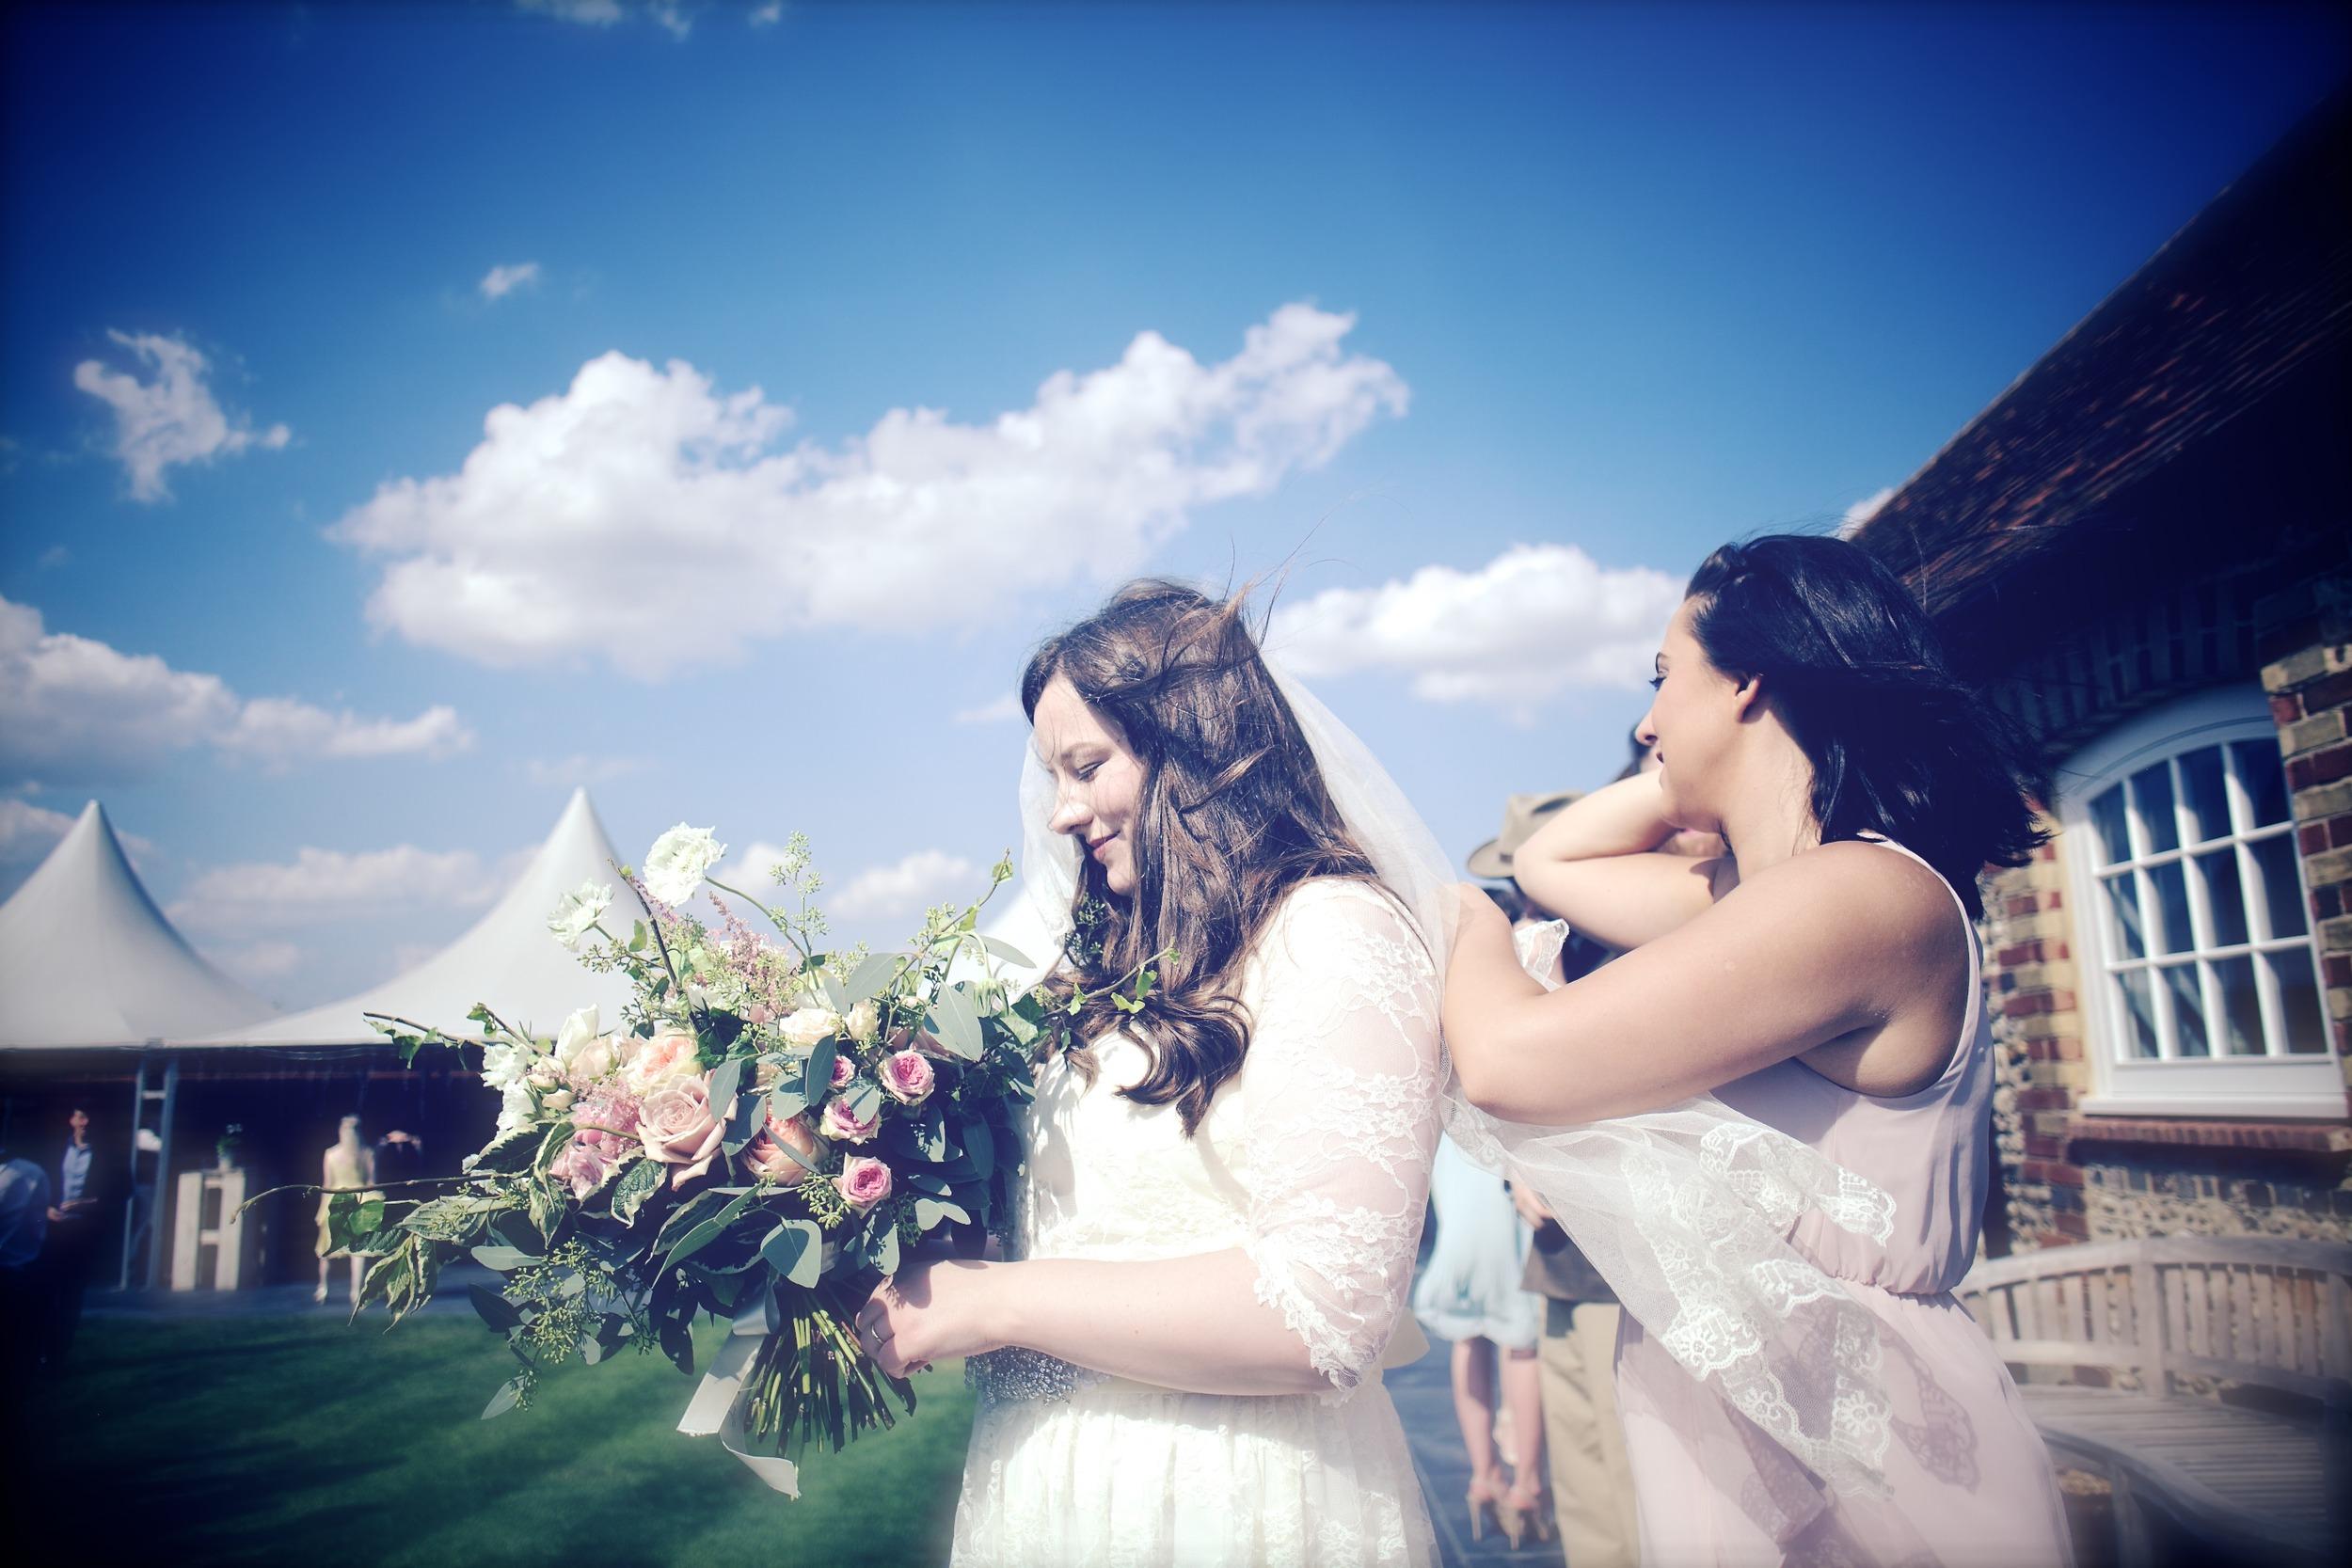 Southend Barn Wedding Venue